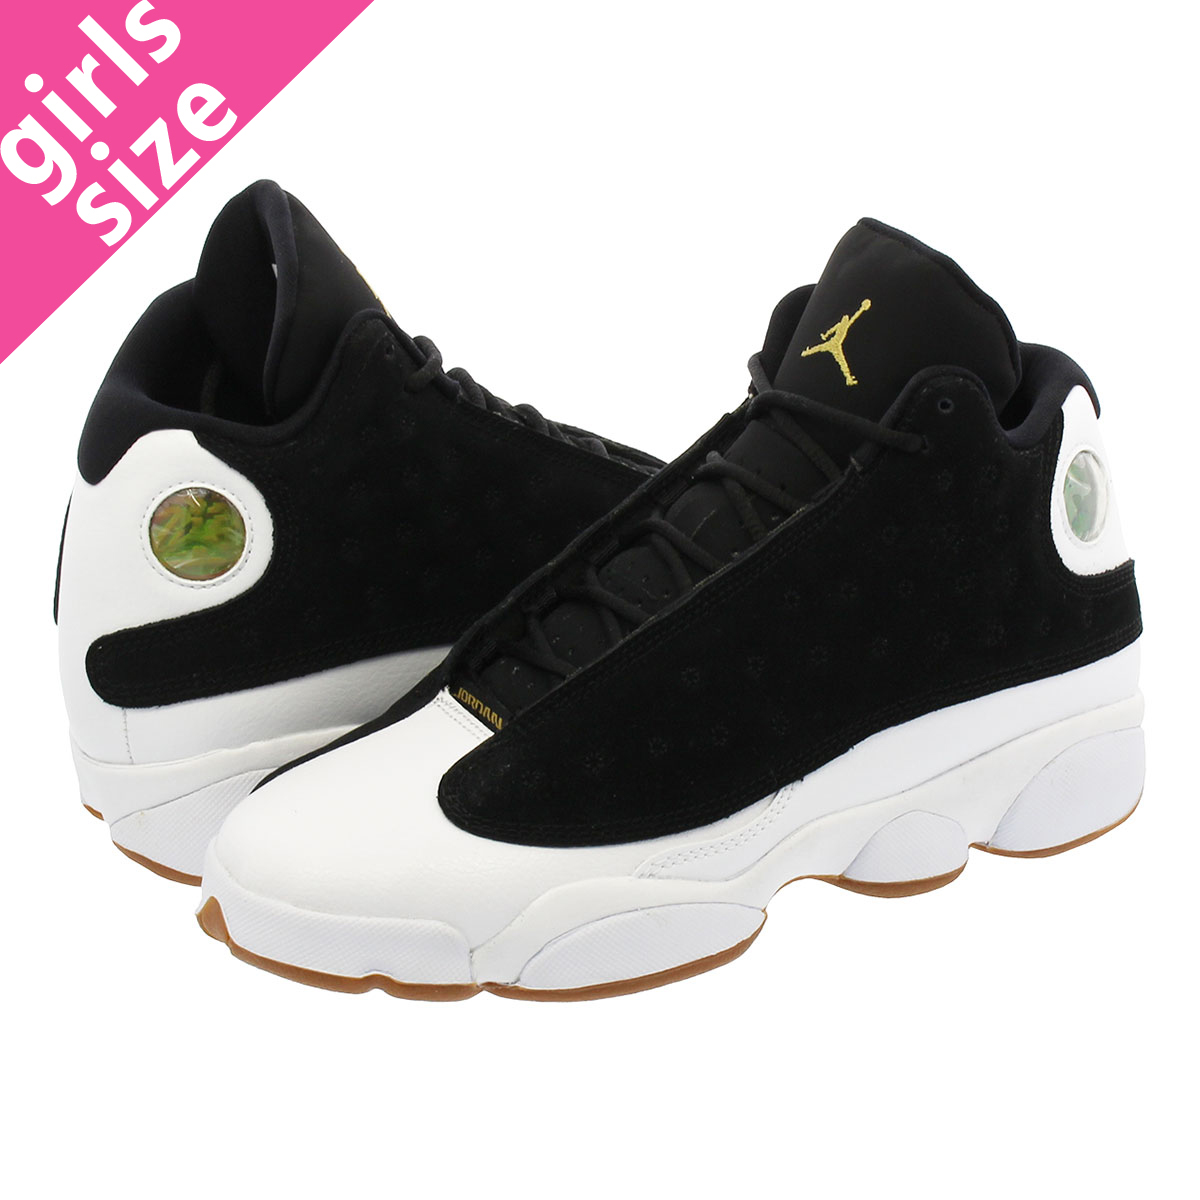 2afb56bd76d7 NIKE AIR JORDAN 13 RETRO GG Nike Air Jordan 13 nostalgic GG BLACK METALLIC  GOLD WHITE GUM MED BROWN